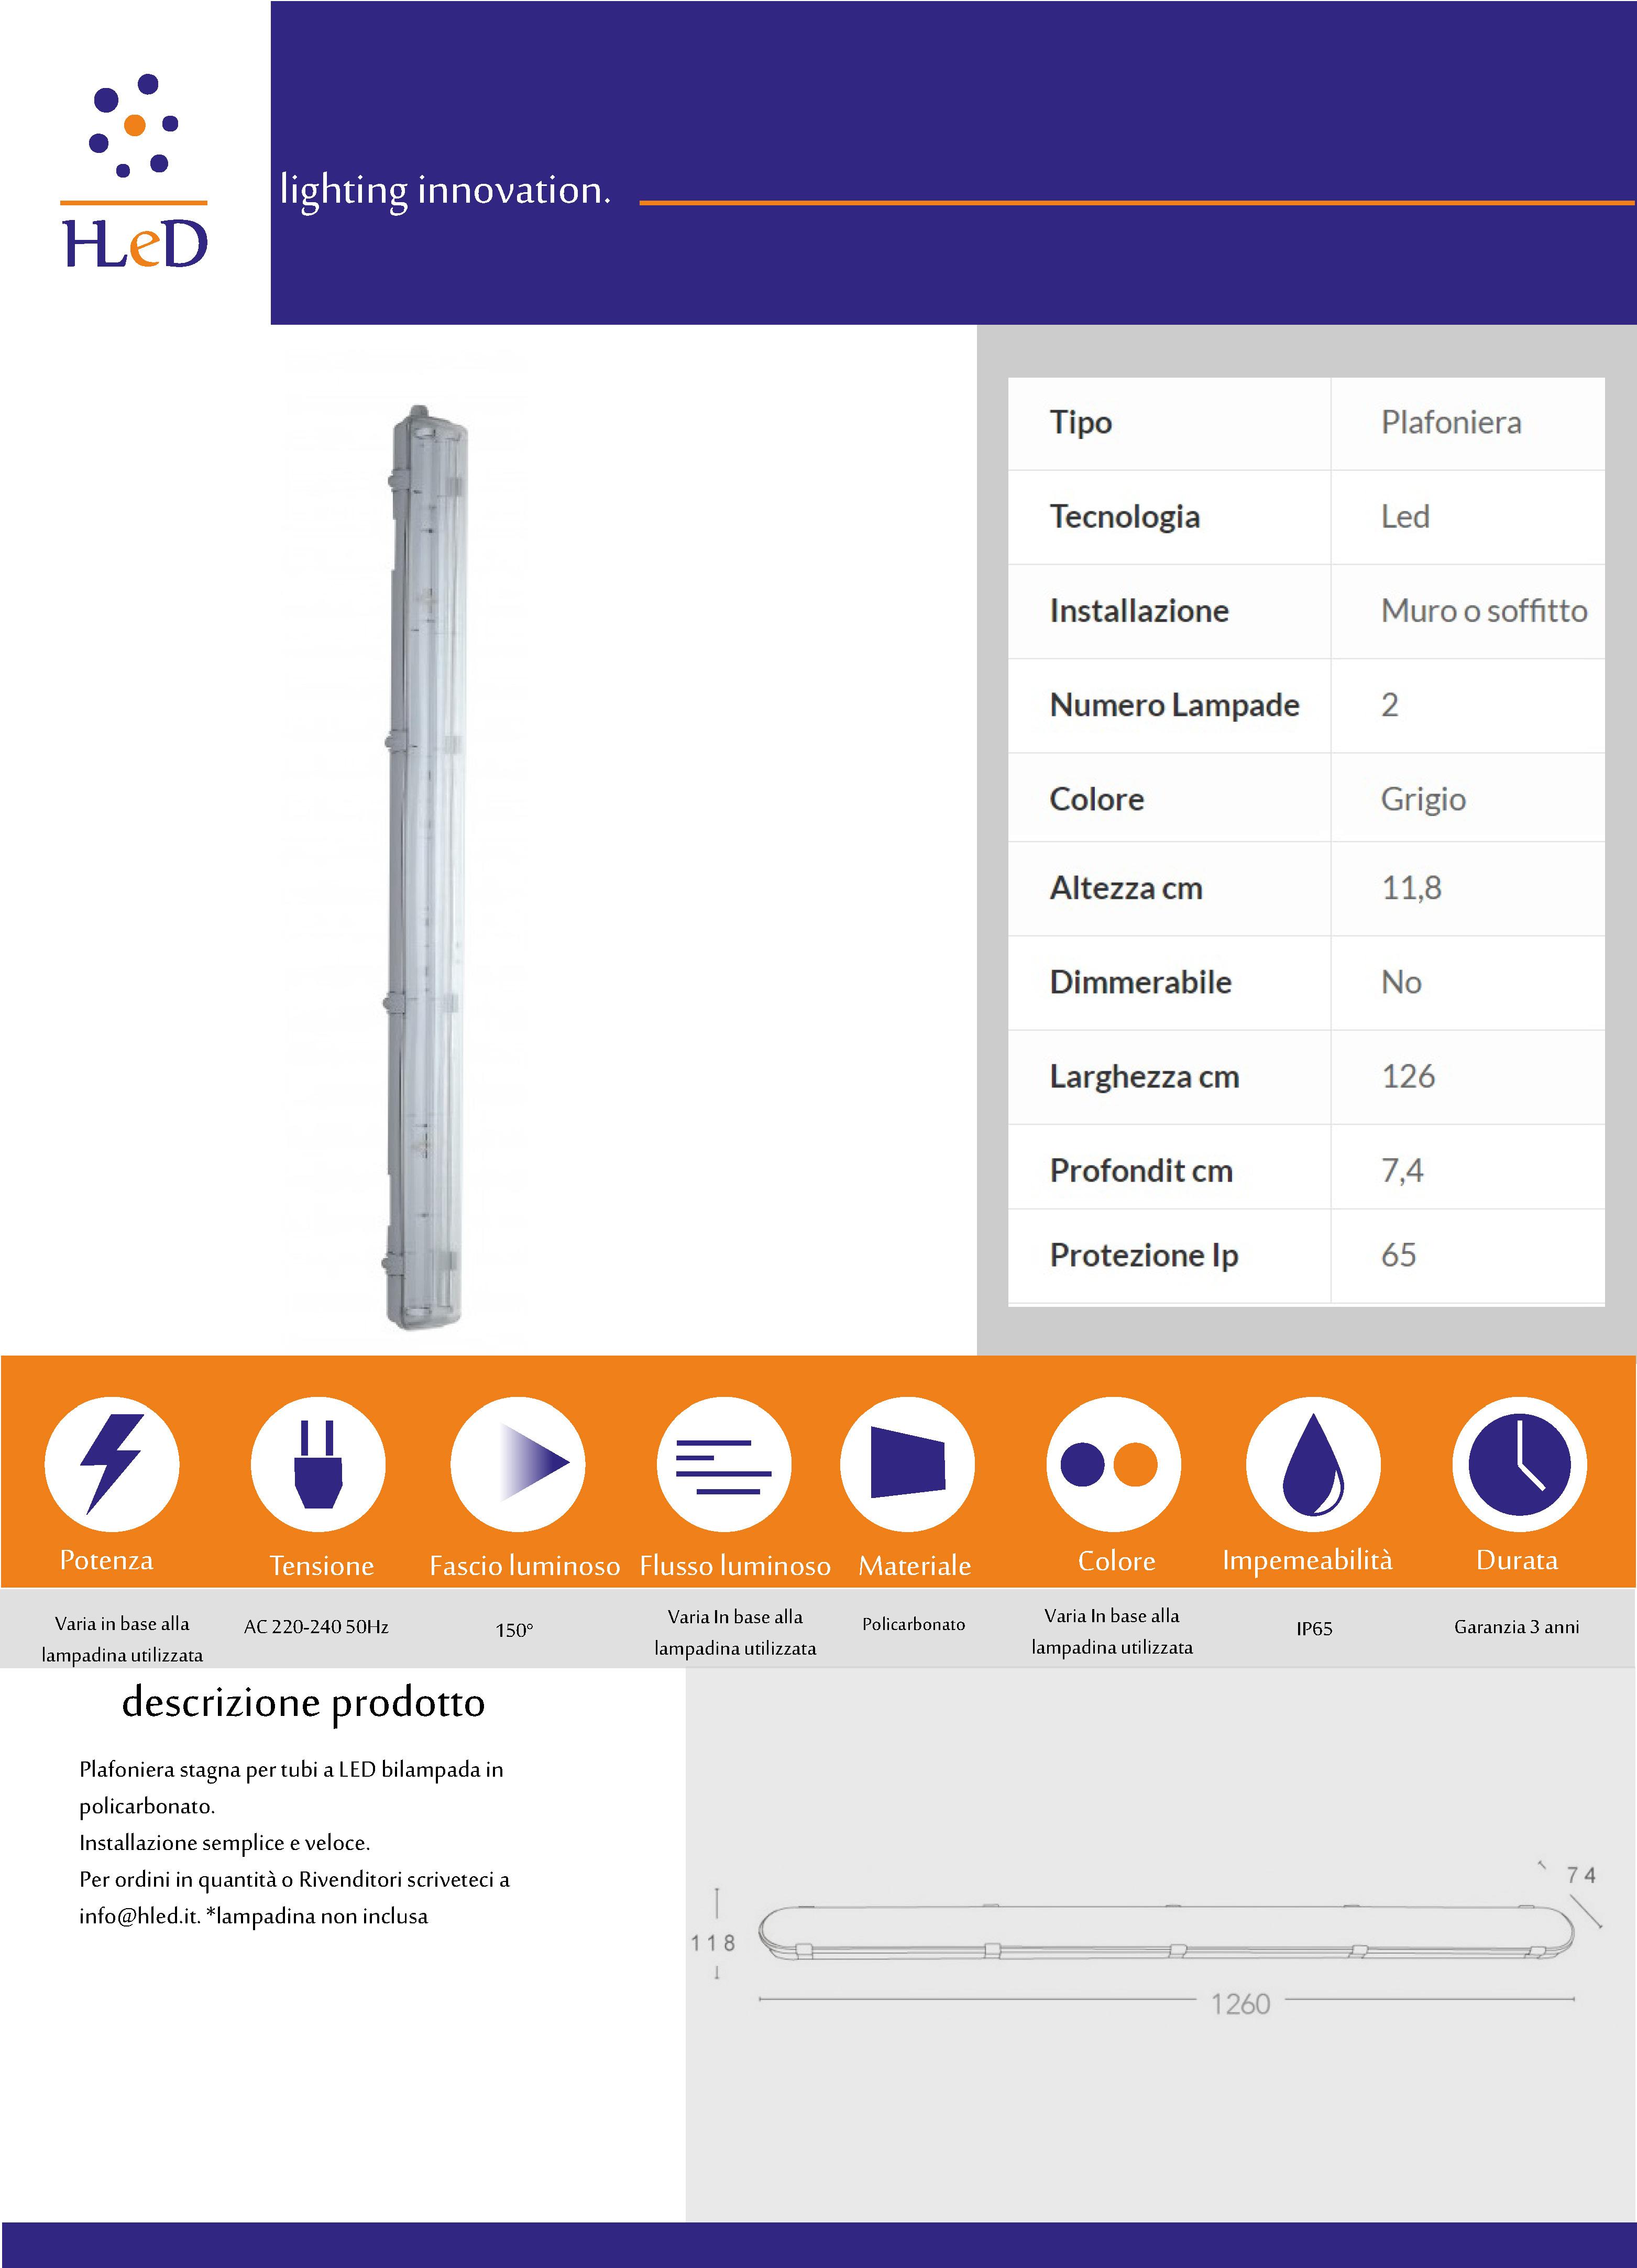 Plafoniera T8 120cm